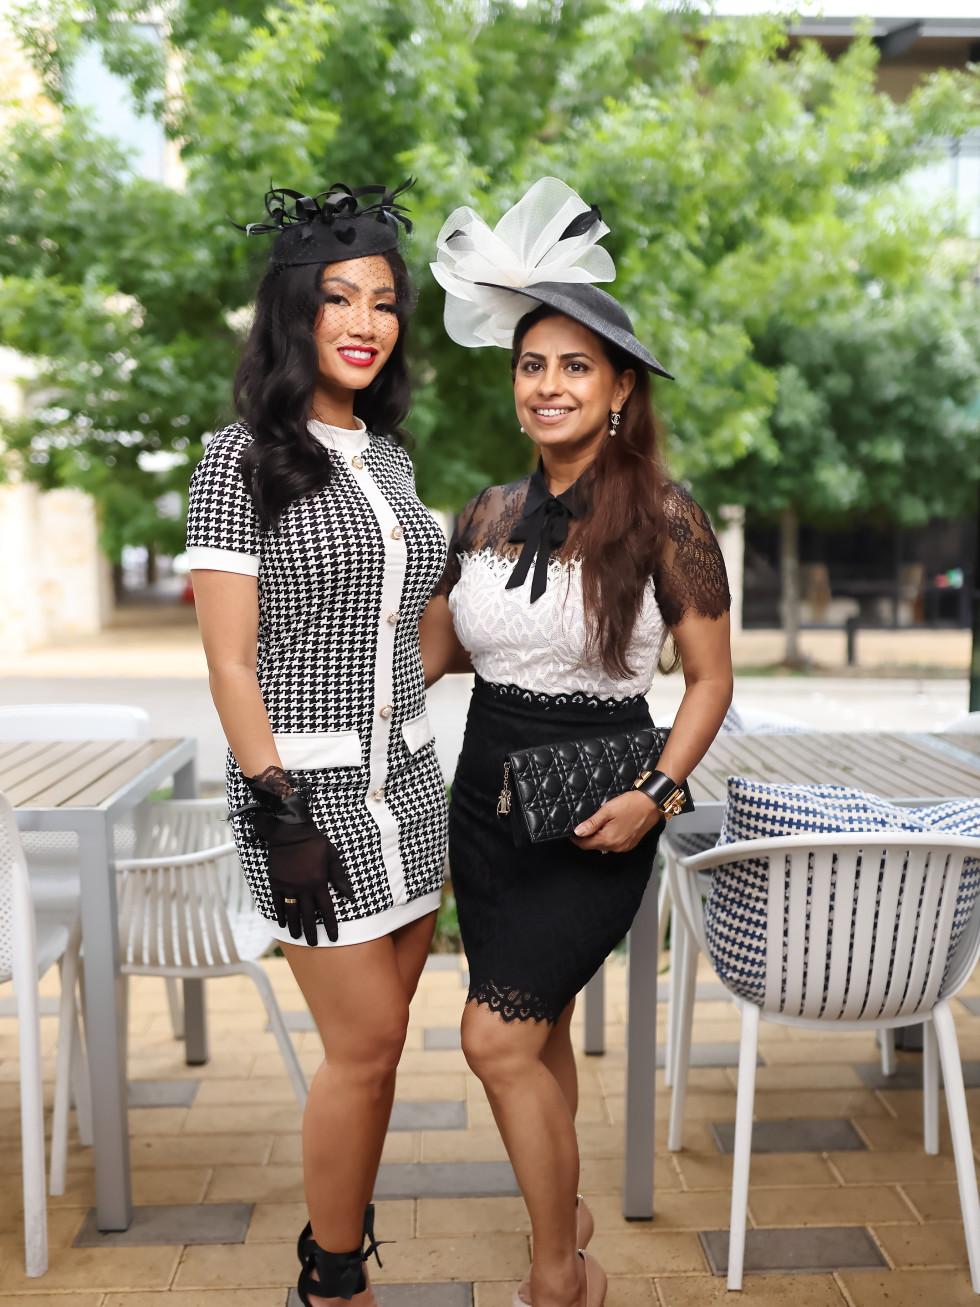 LCA Houston Mother's Day Bubbles & Bites 2021 Terri Ho Ruchi Mukherjee